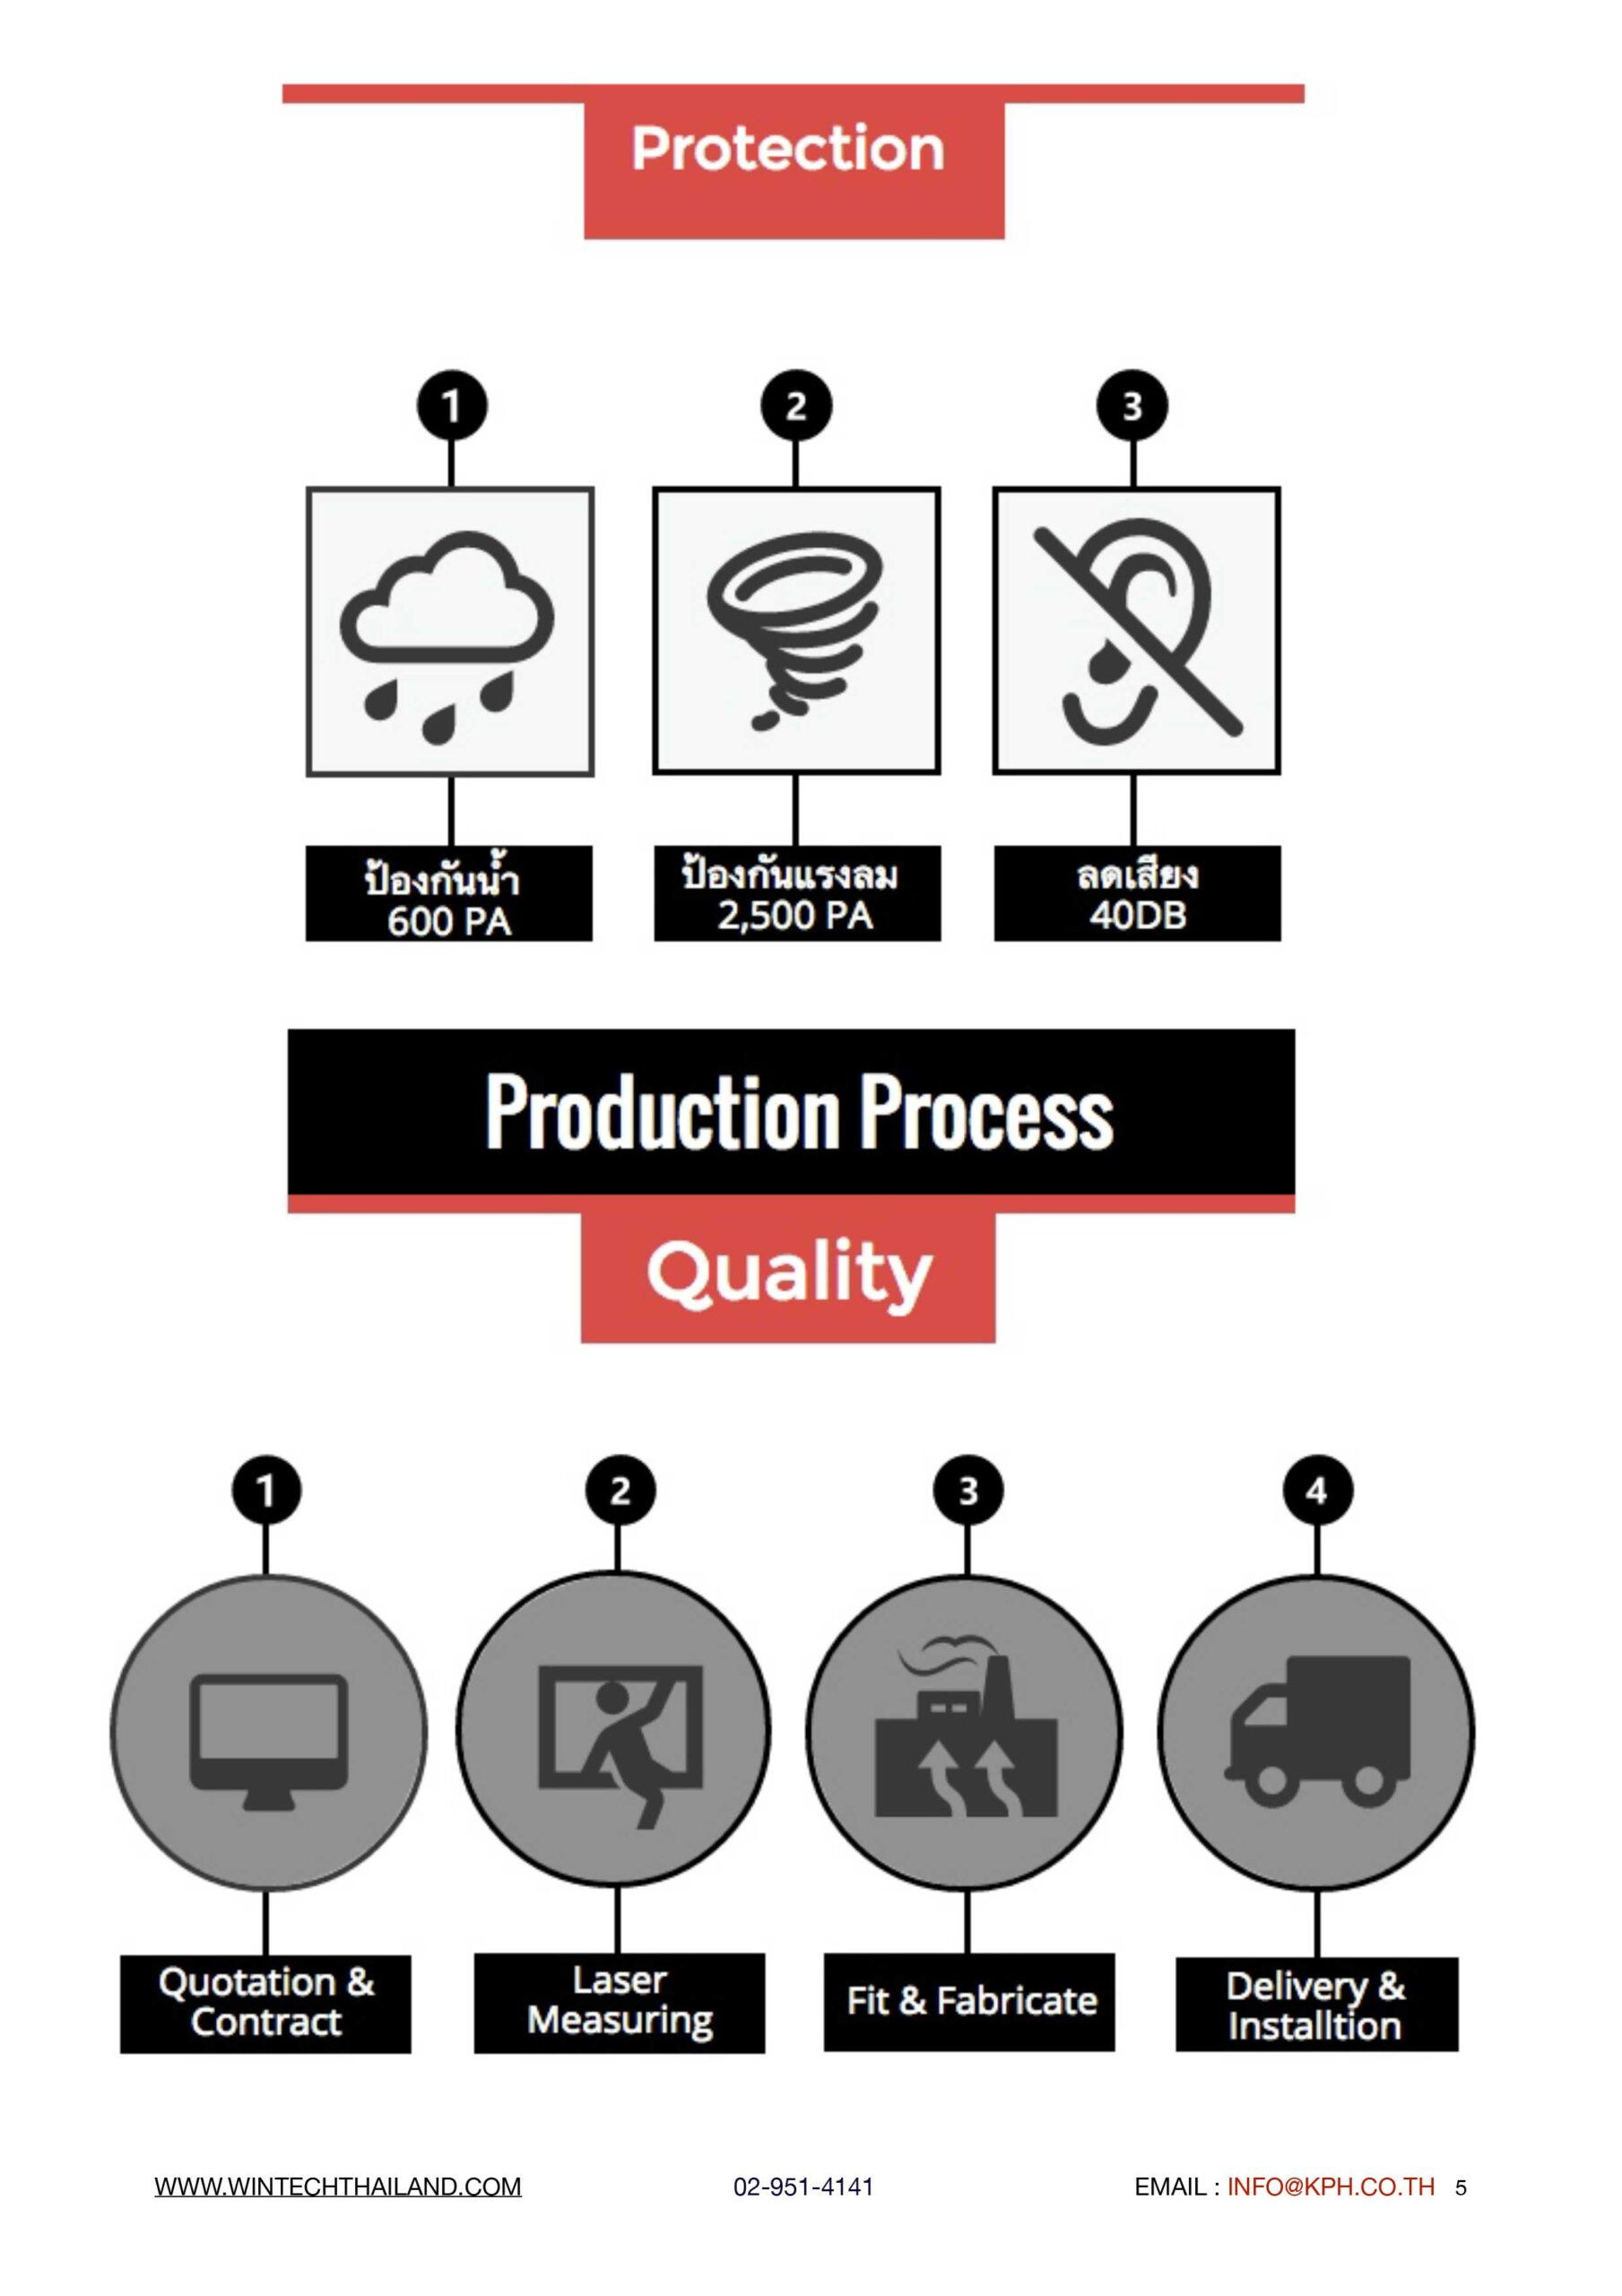 Wintech-Italy-Brochure-commp-5